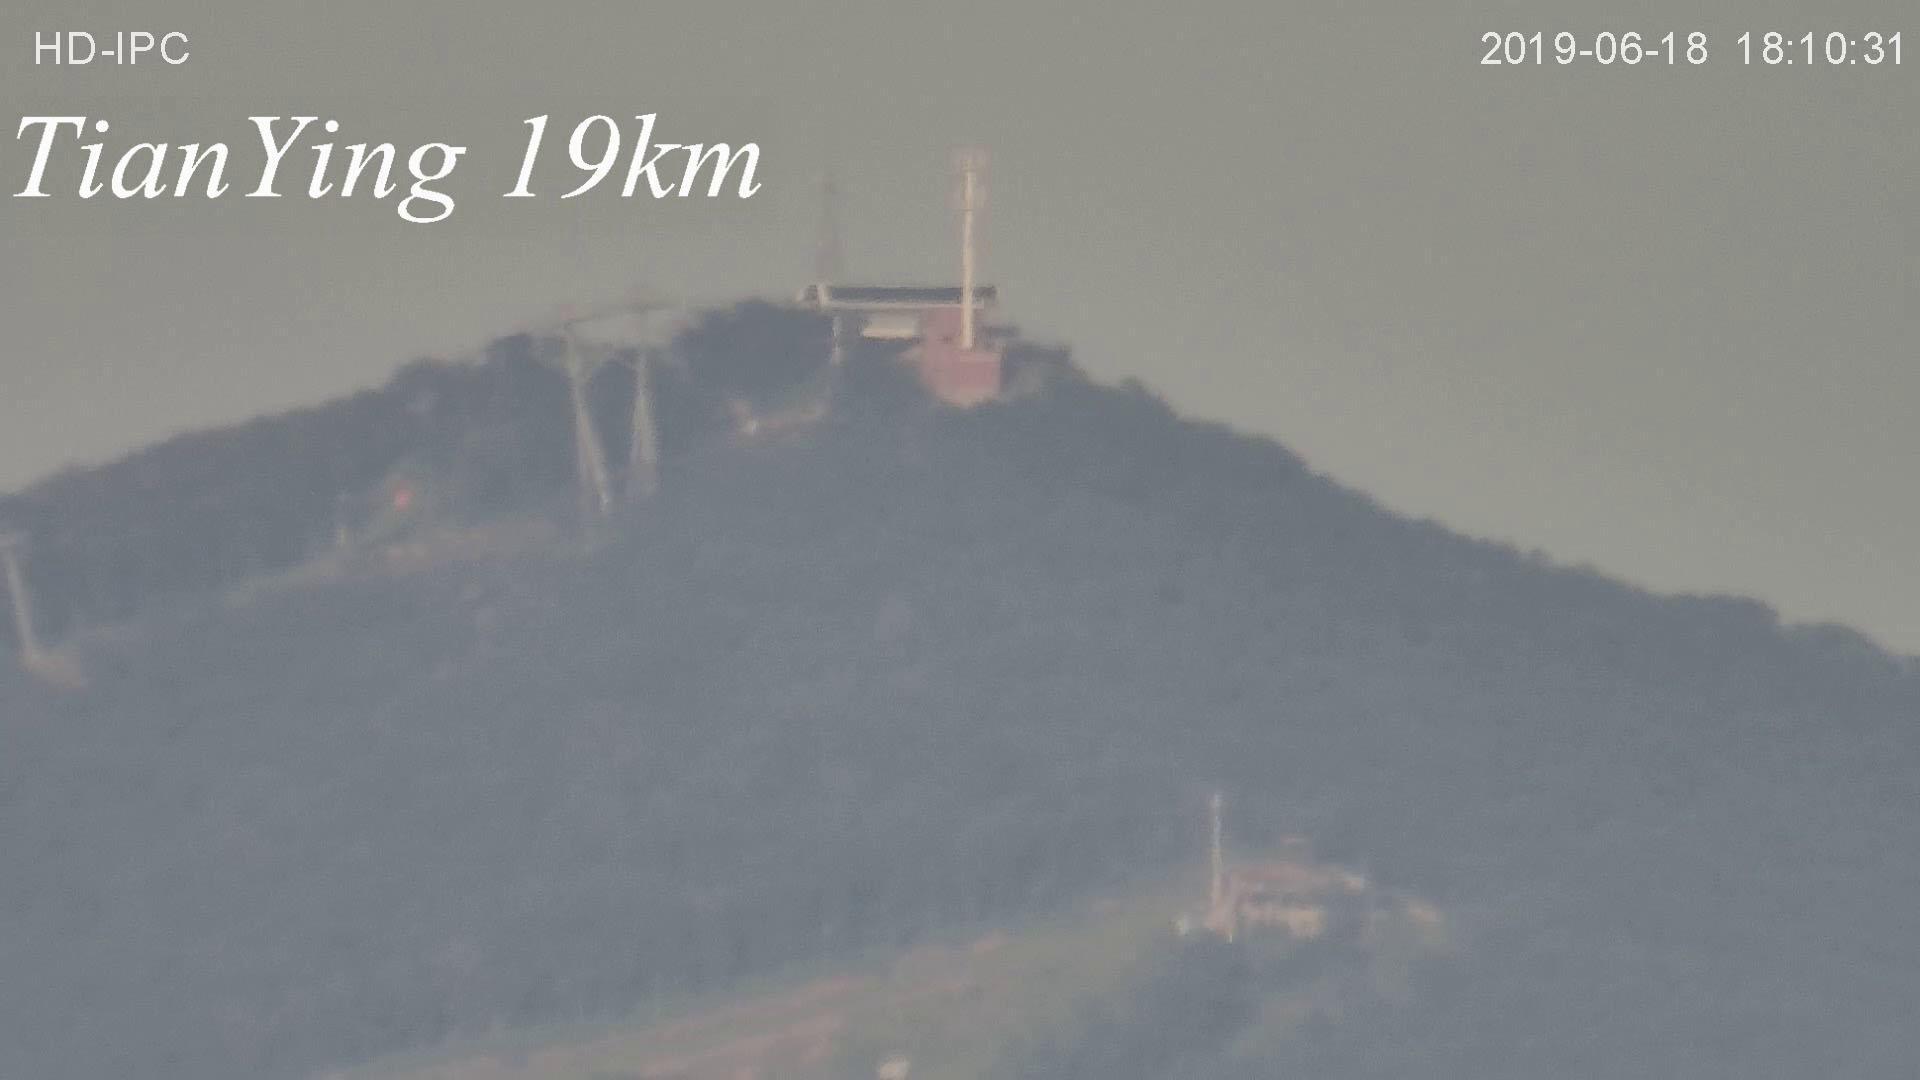 C750 14km/20km Cooled Thermal Imaging Camera - Narrow FOV